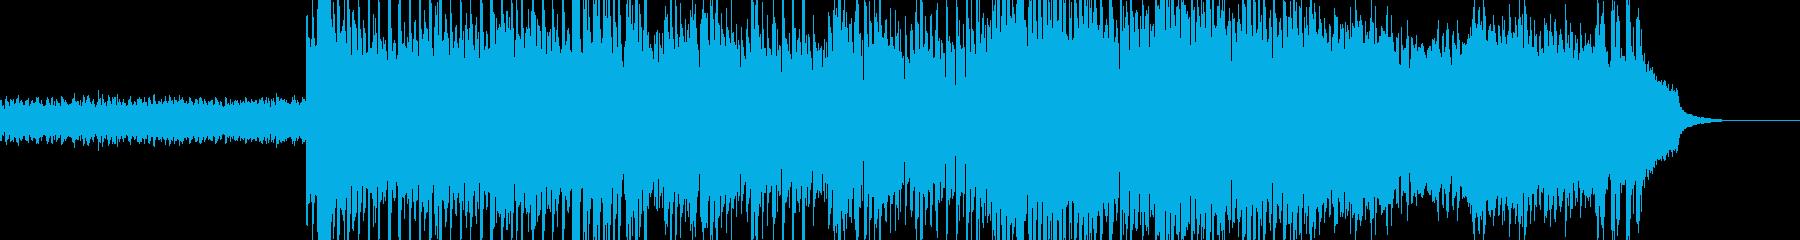 Future bass系EDMの曲の再生済みの波形